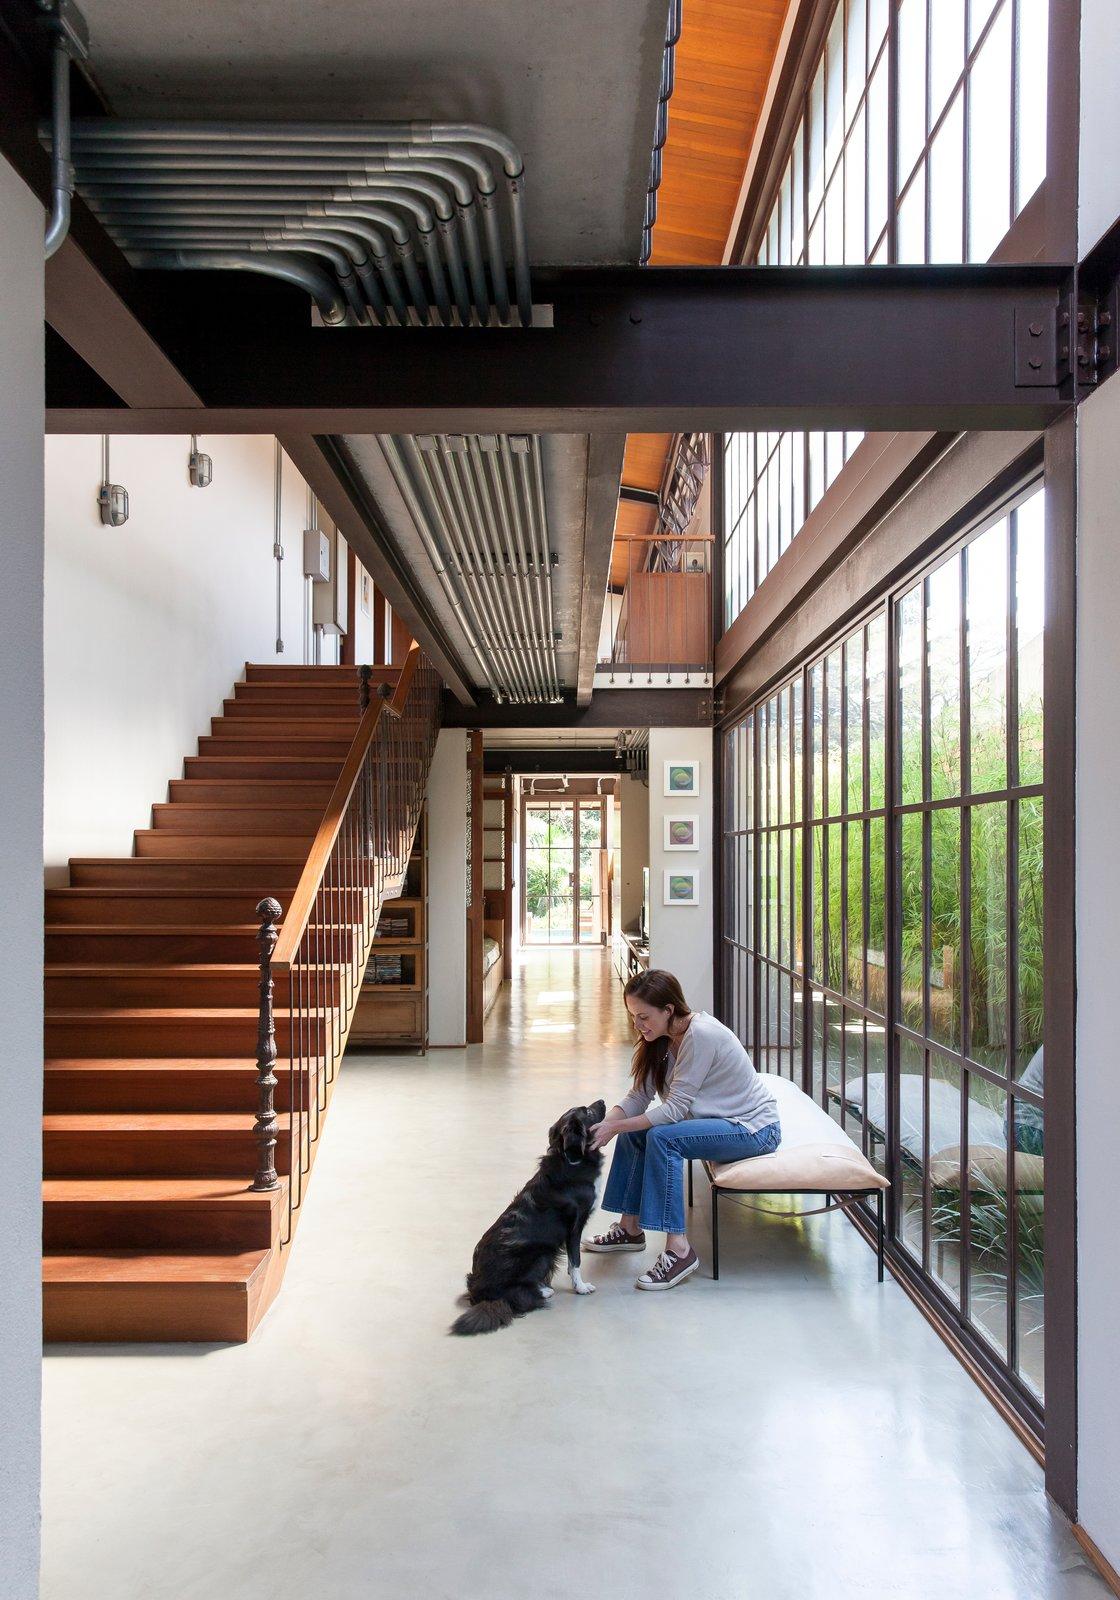 Conde D'eu House stairway